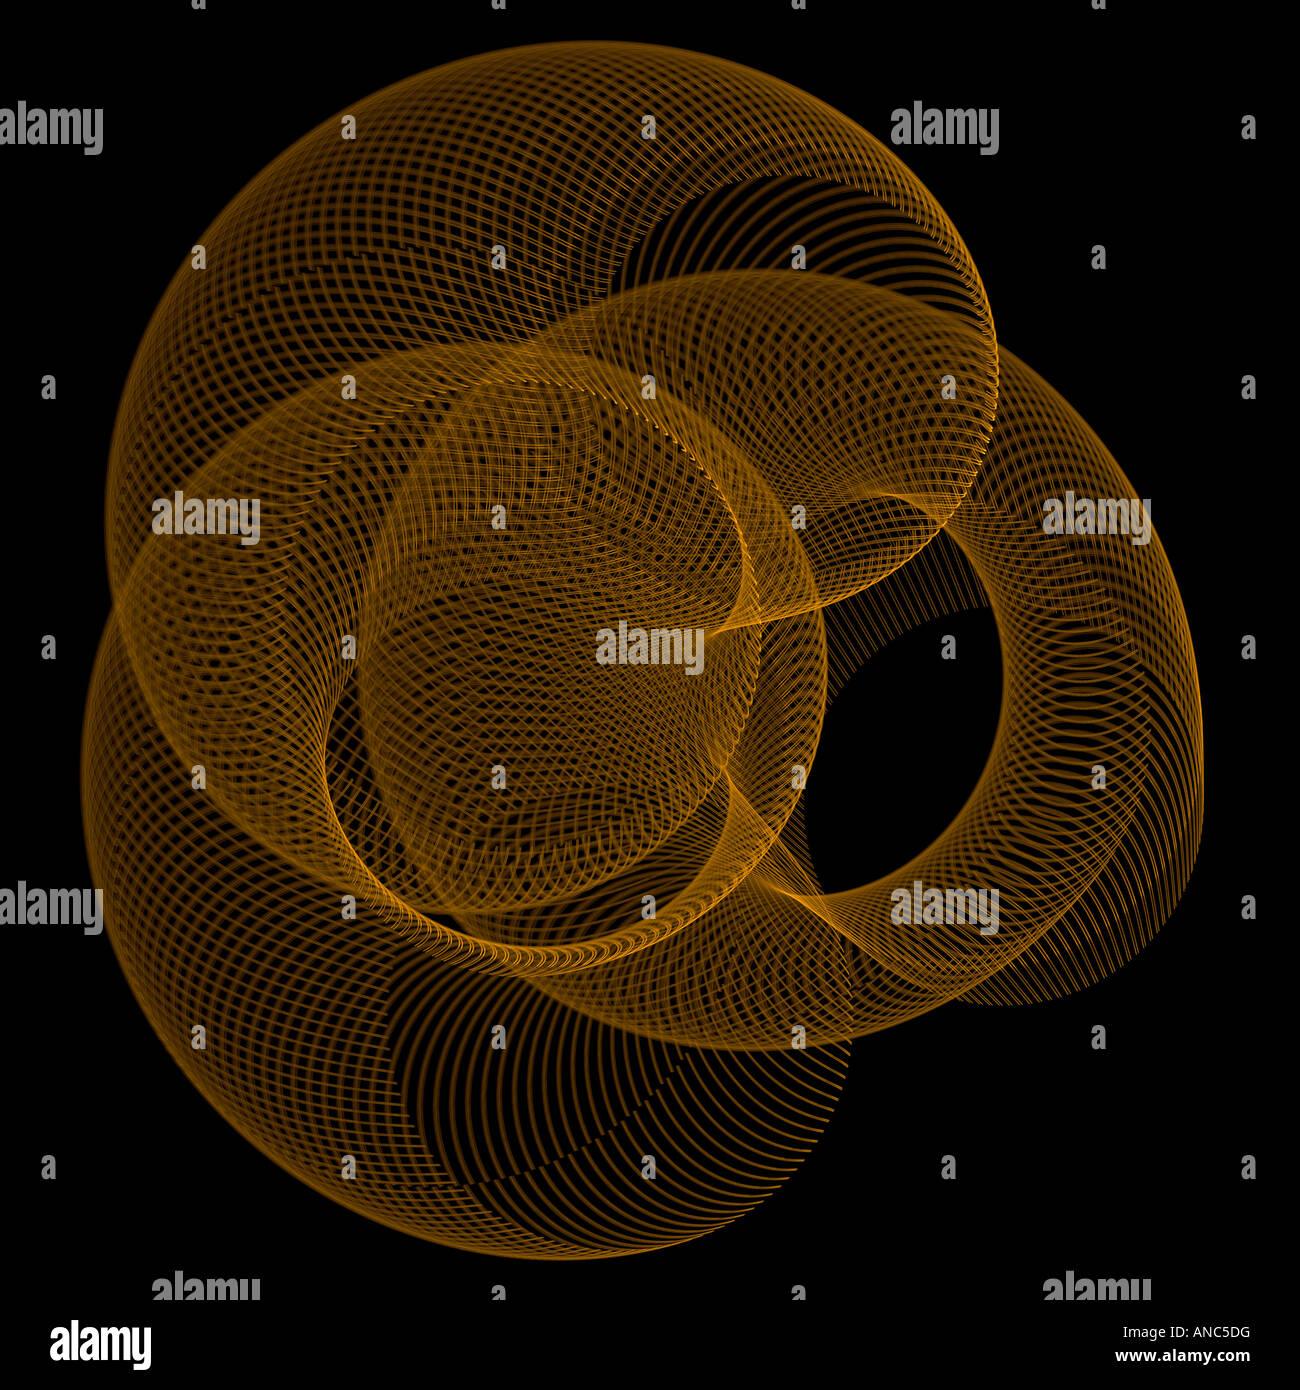 Abstract frattale che assomiglia a un twisted slinky giocattolo mesh Immagini Stock